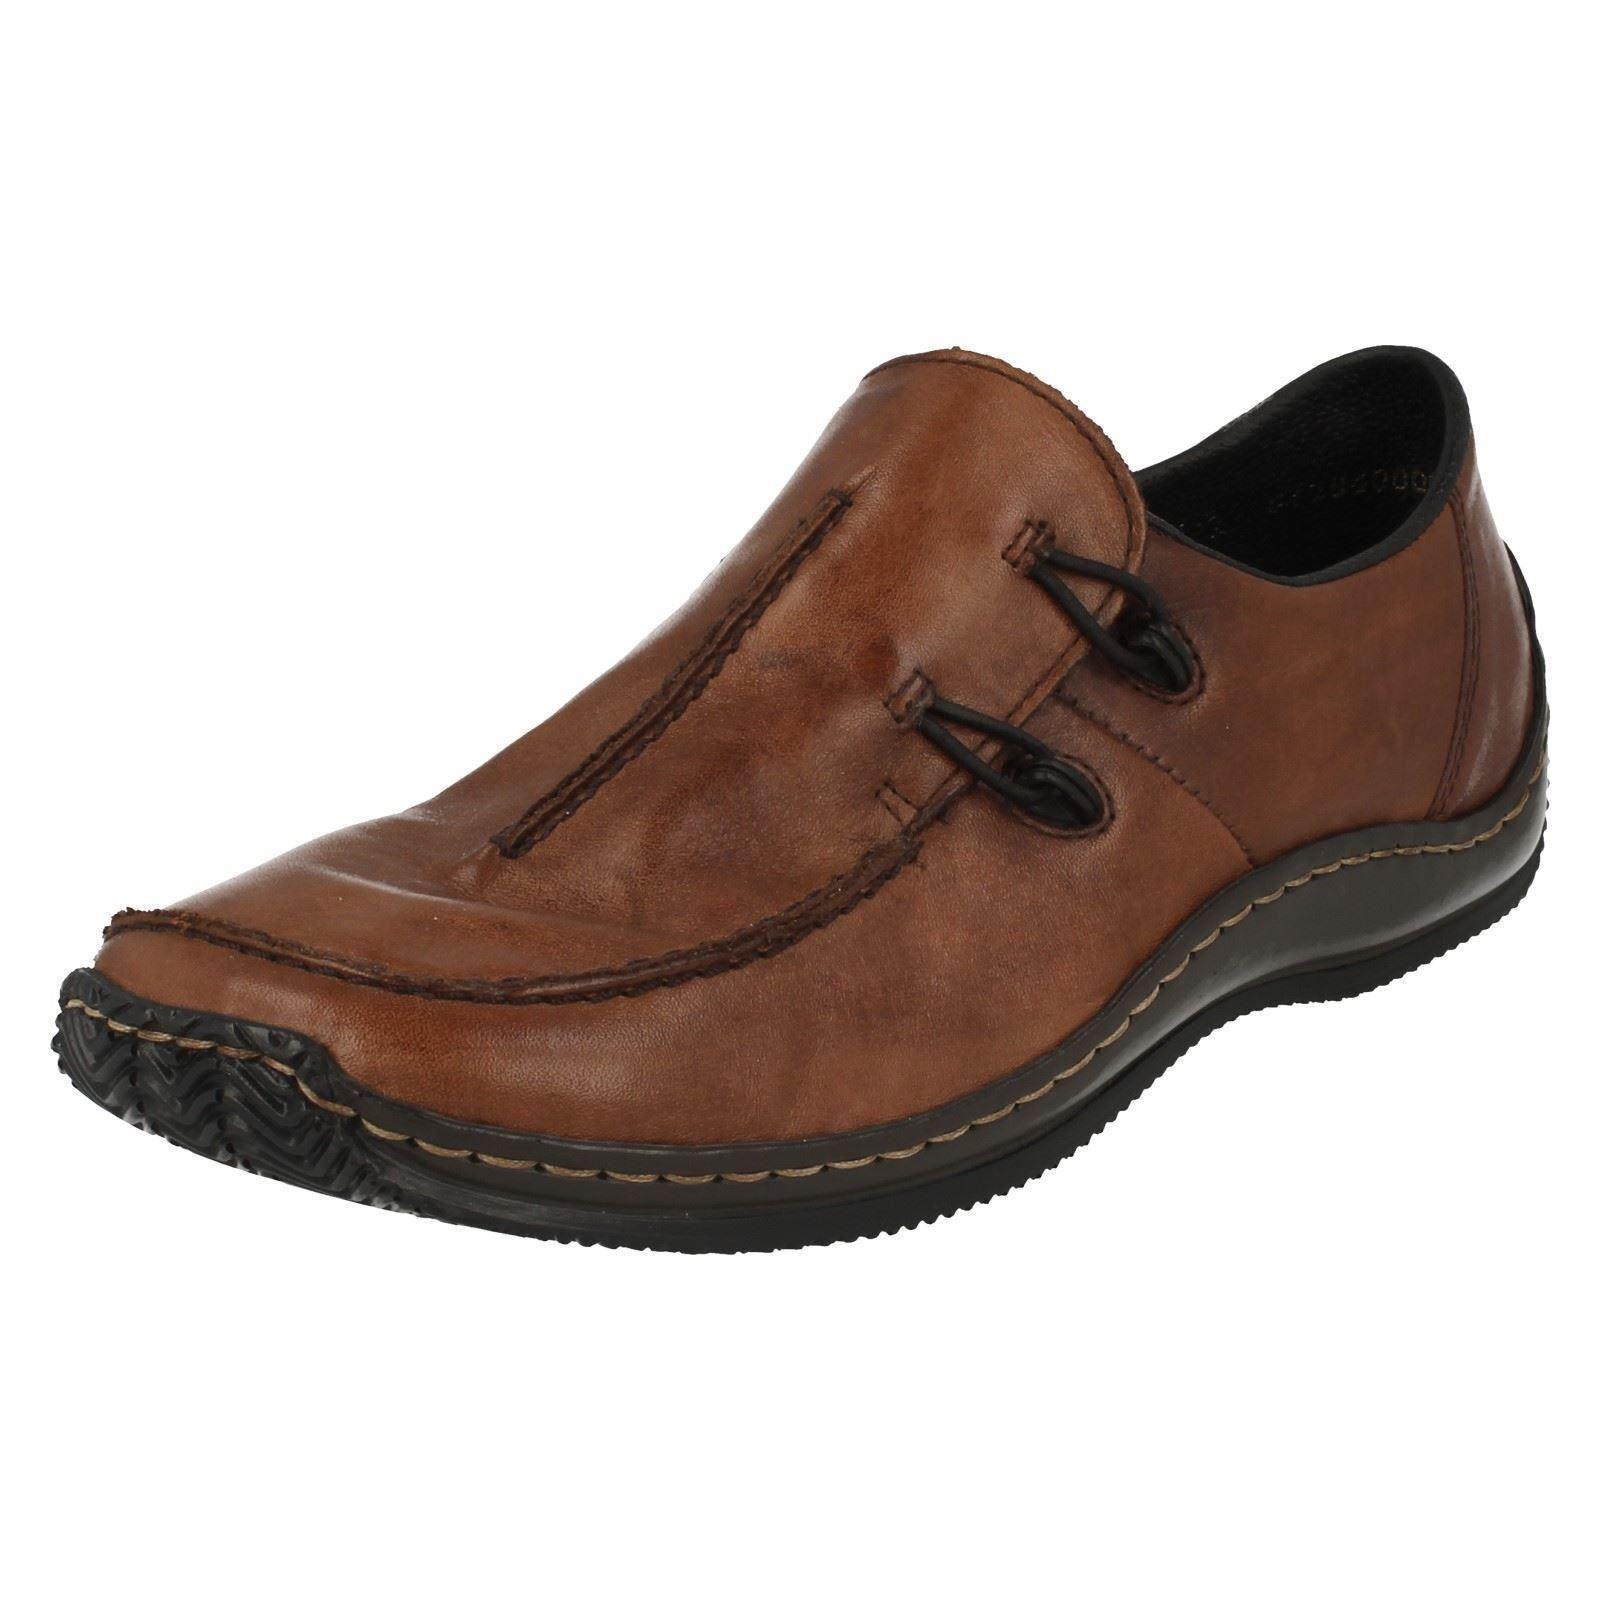 Rieker L1751 Chaussure à Enfiler Cuir